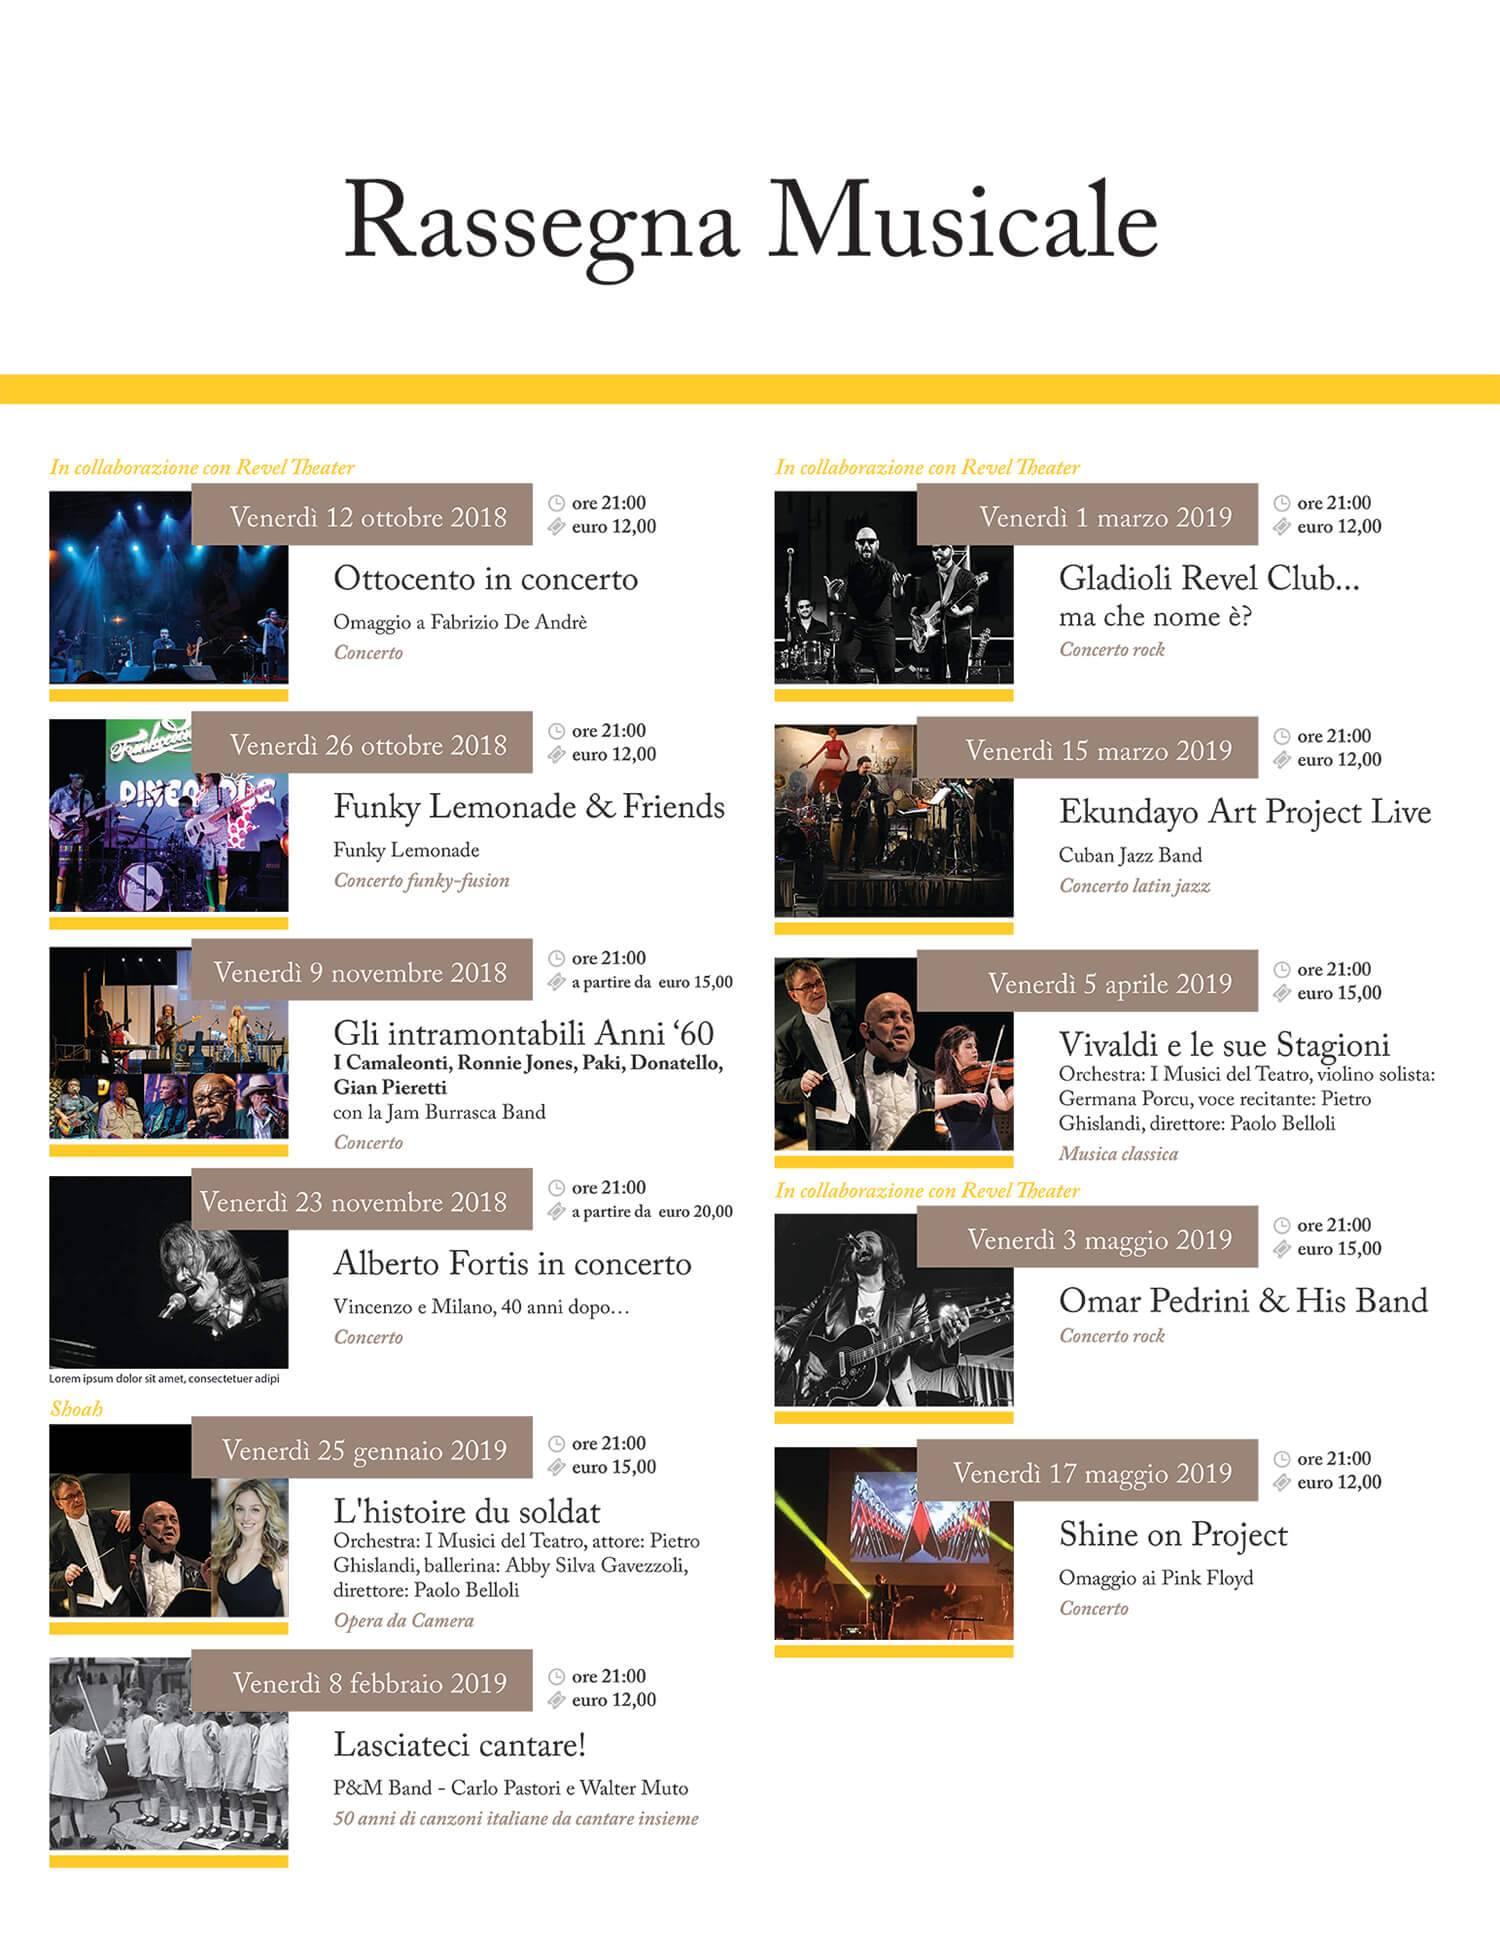 tft_rassegna_musicale_18_19_54x70